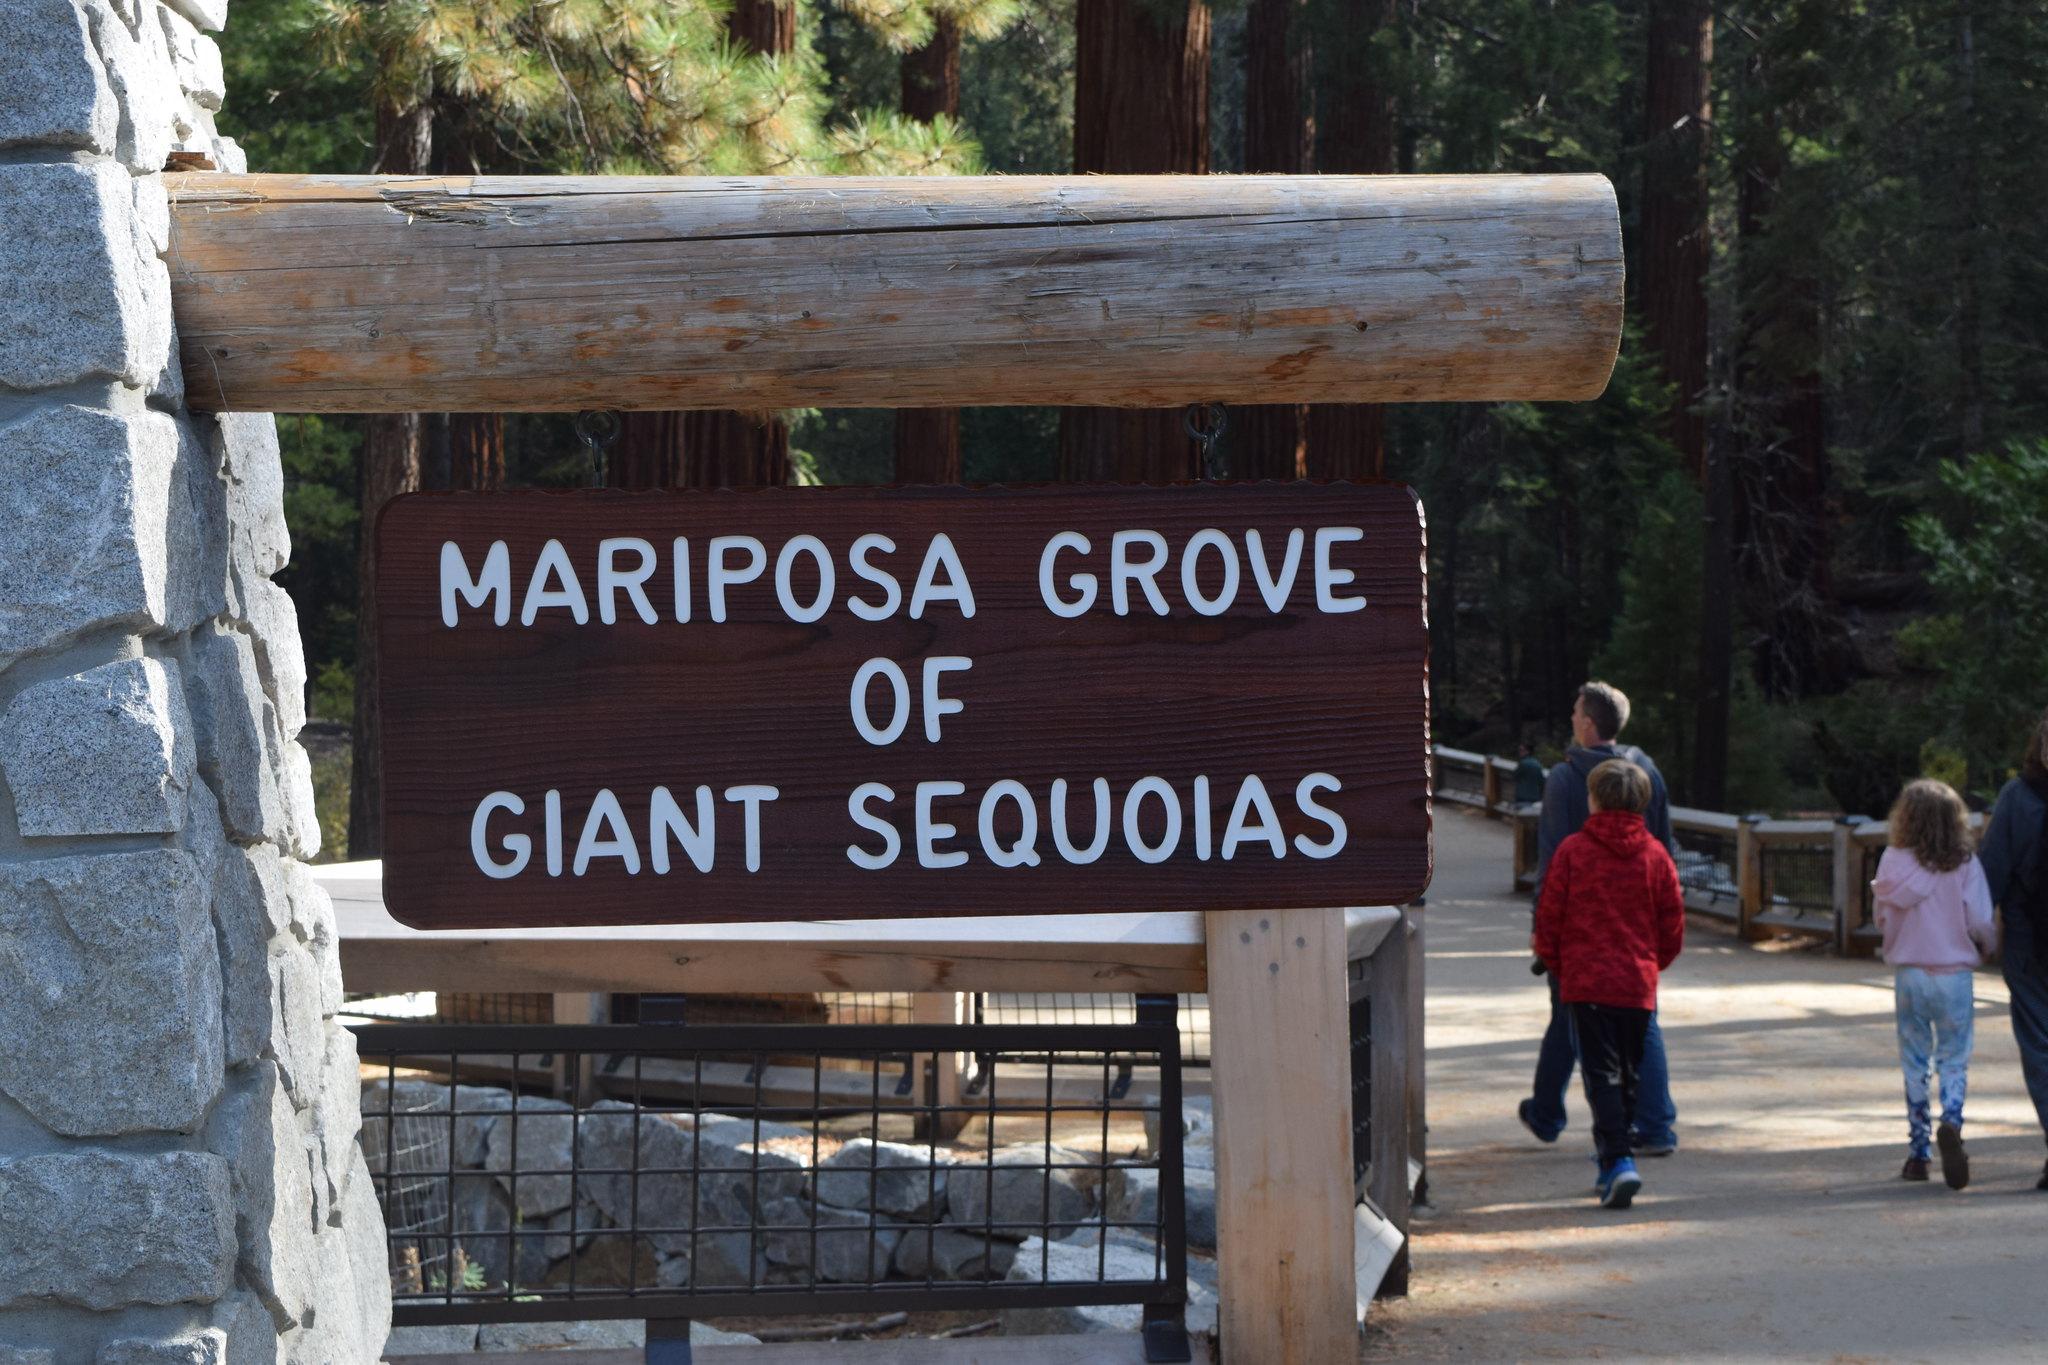 Yosemite National Park-Maripose Grove of Giant Sequoia